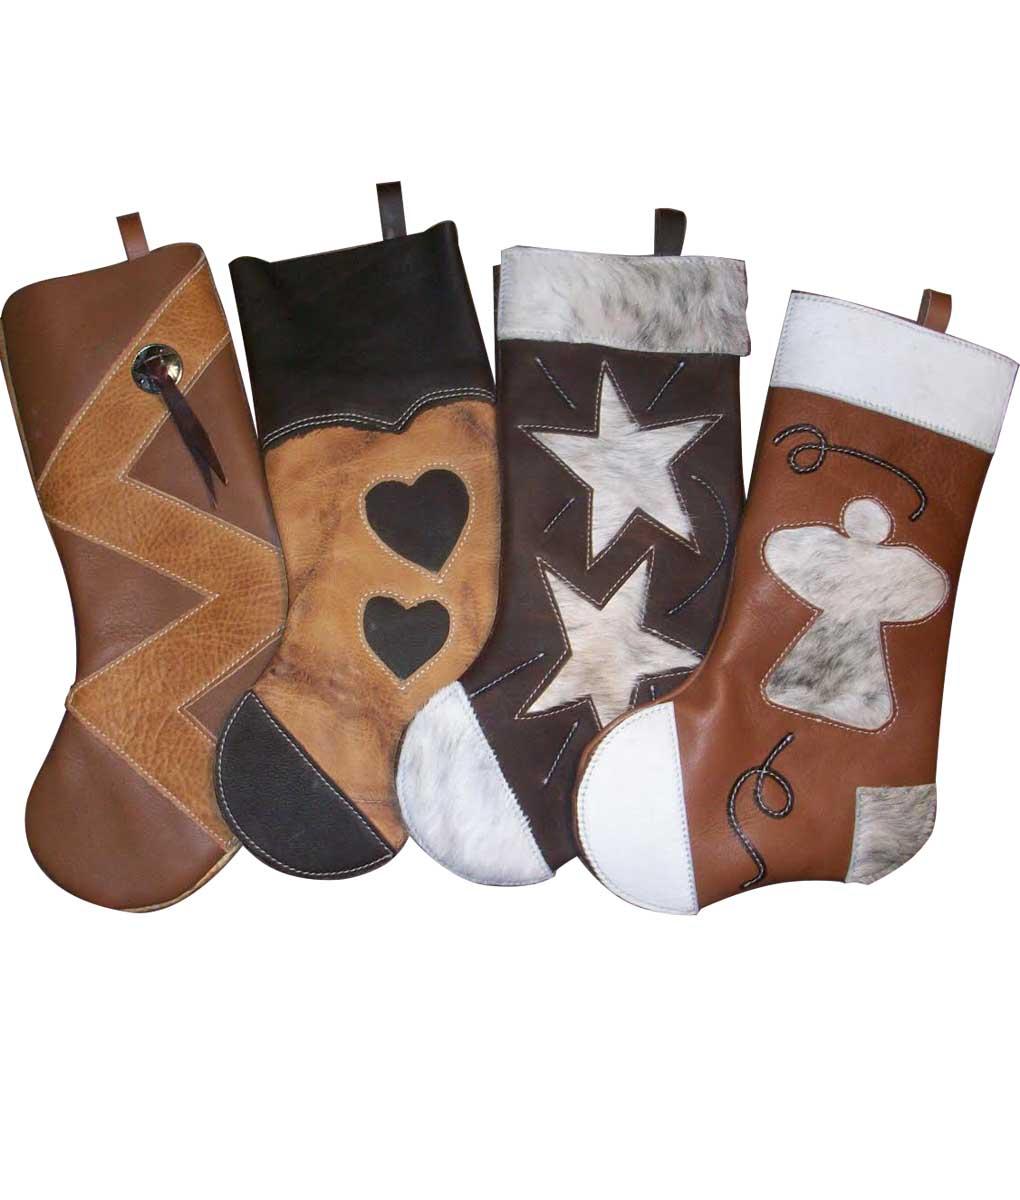 Cowhide Christmas stockings group